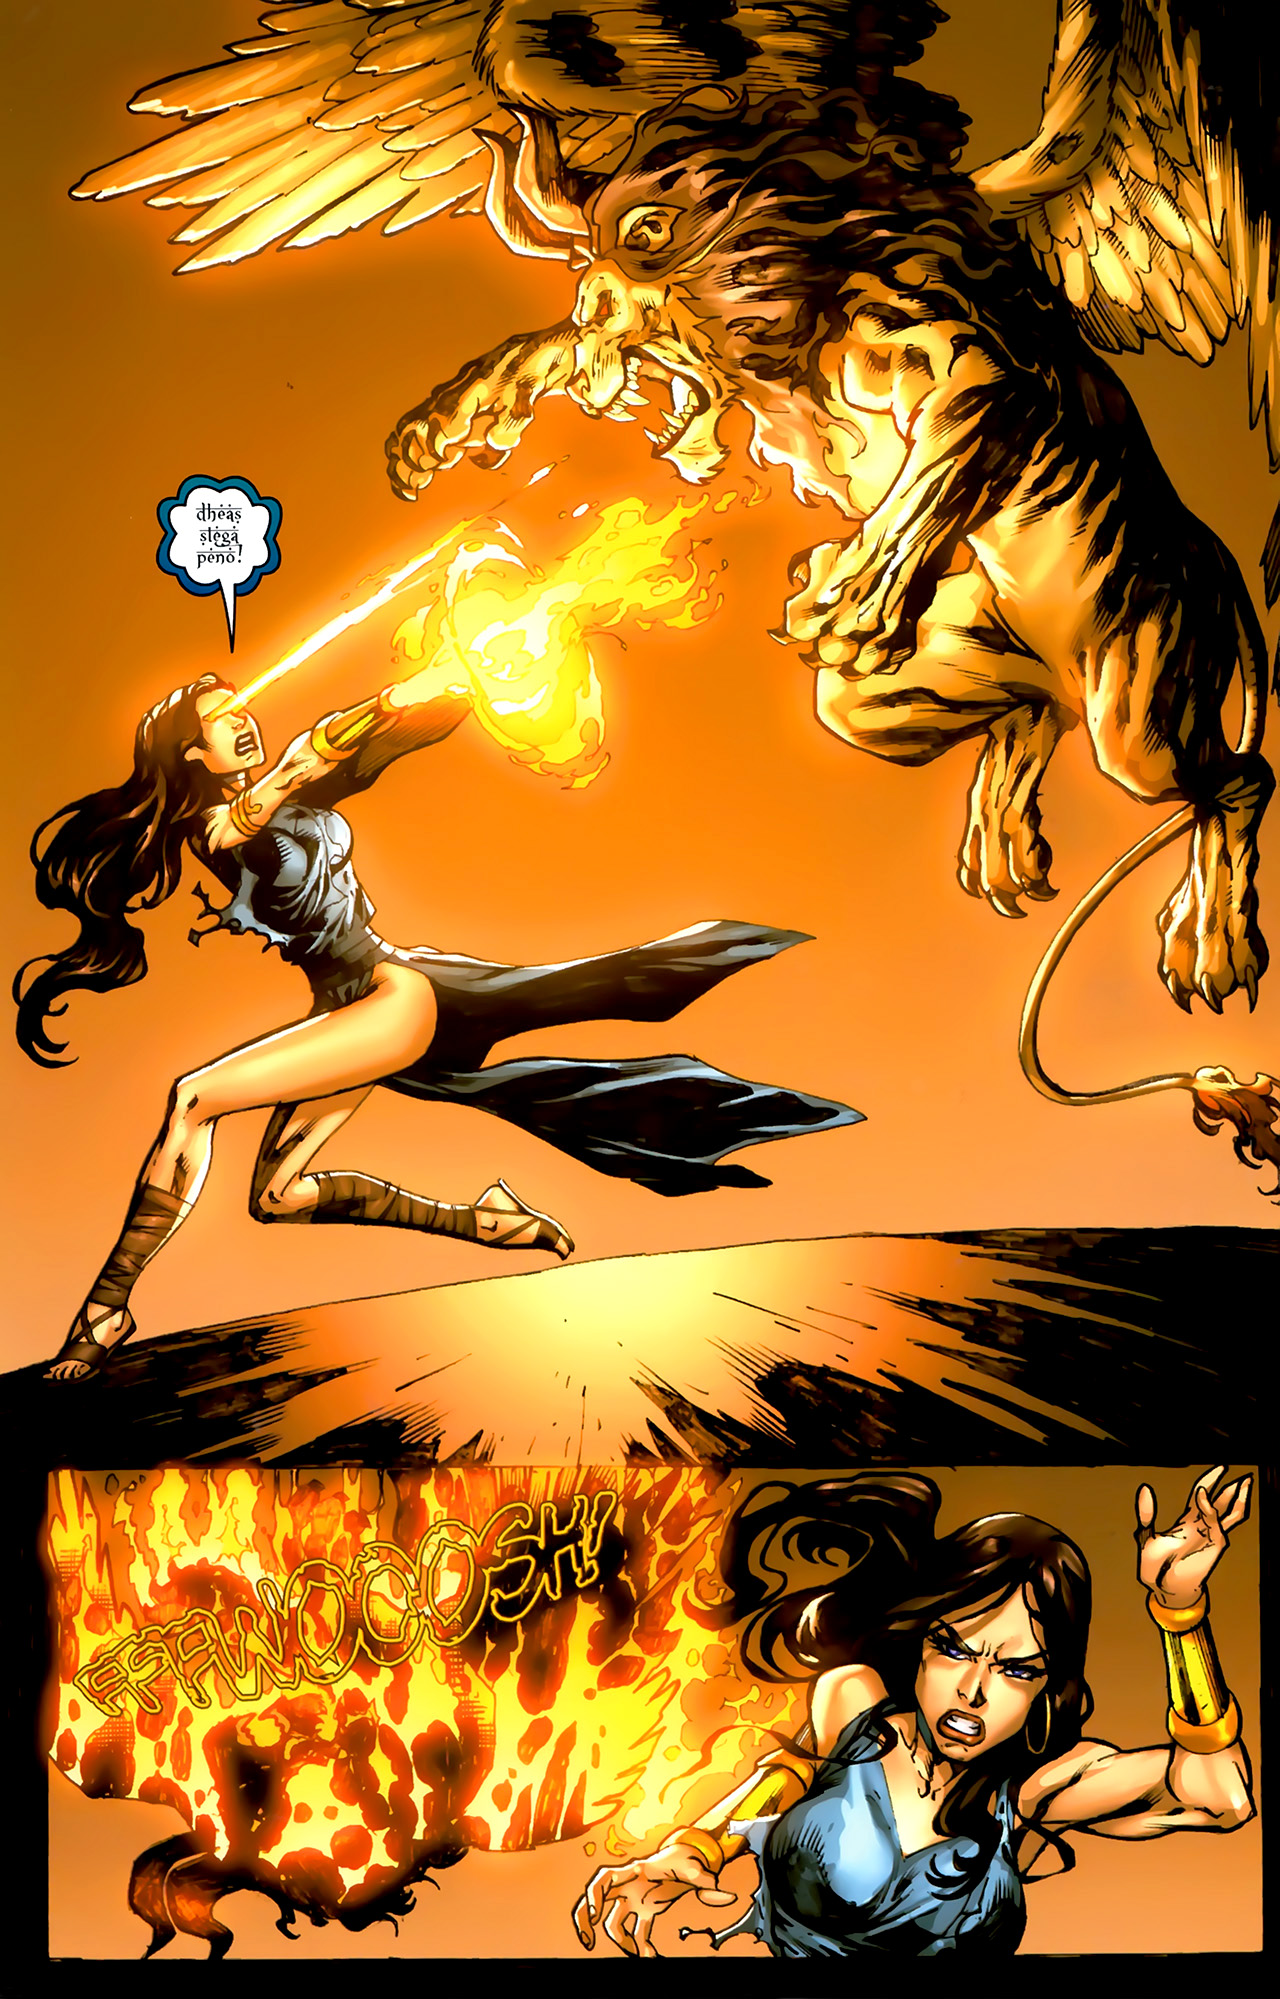 Read online 1001 Arabian Nights: The Adventures of Sinbad comic -  Issue #4 - 11